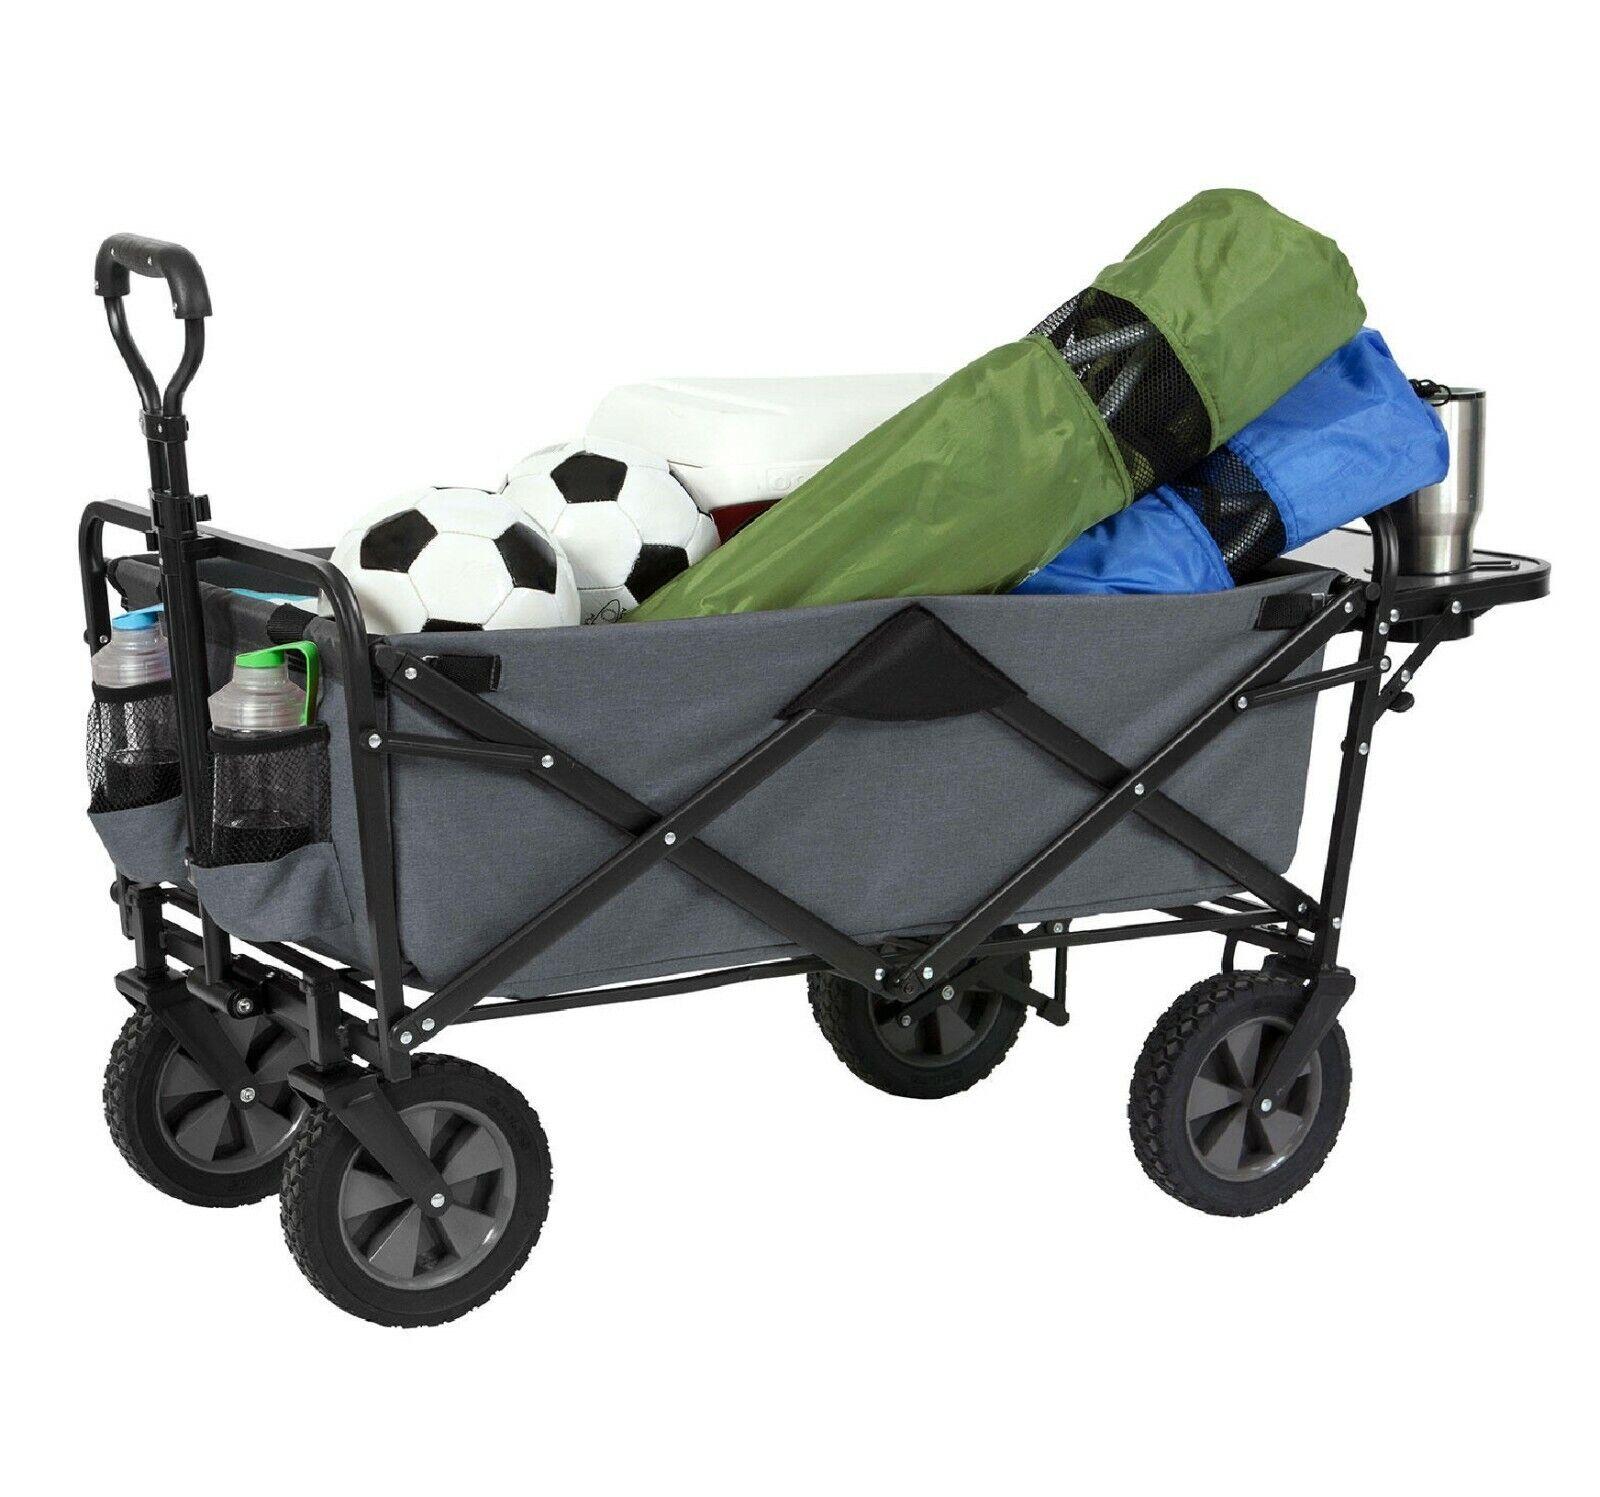 Folding Wagon Sports Utility Beach Cart with Table Mac Suppl